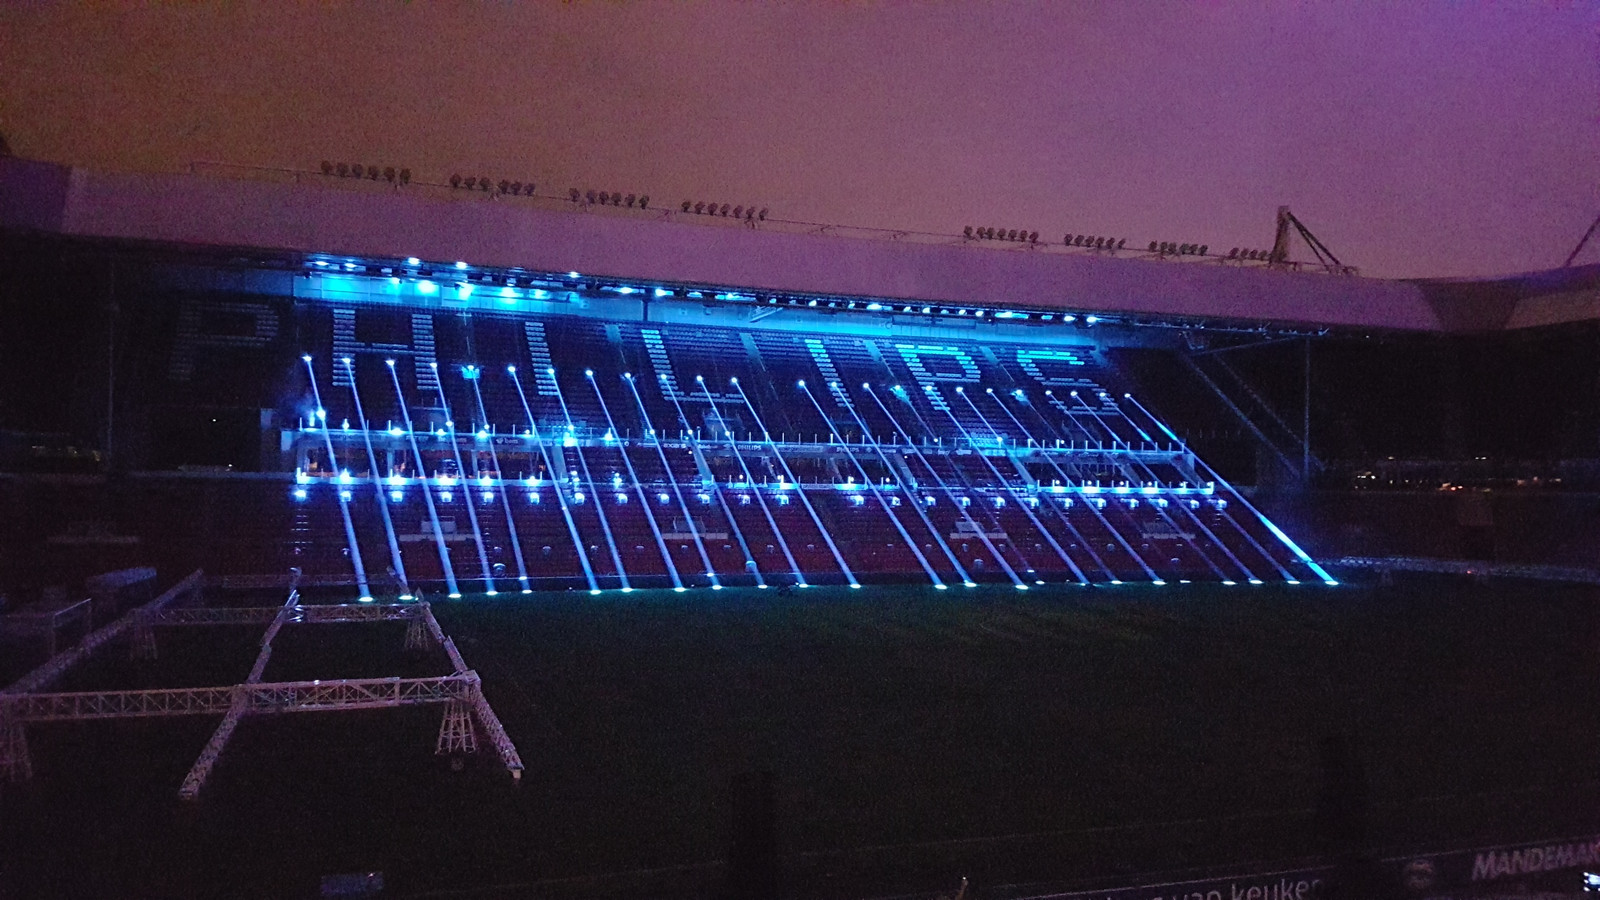 Glow 2018 - Philips Stadion